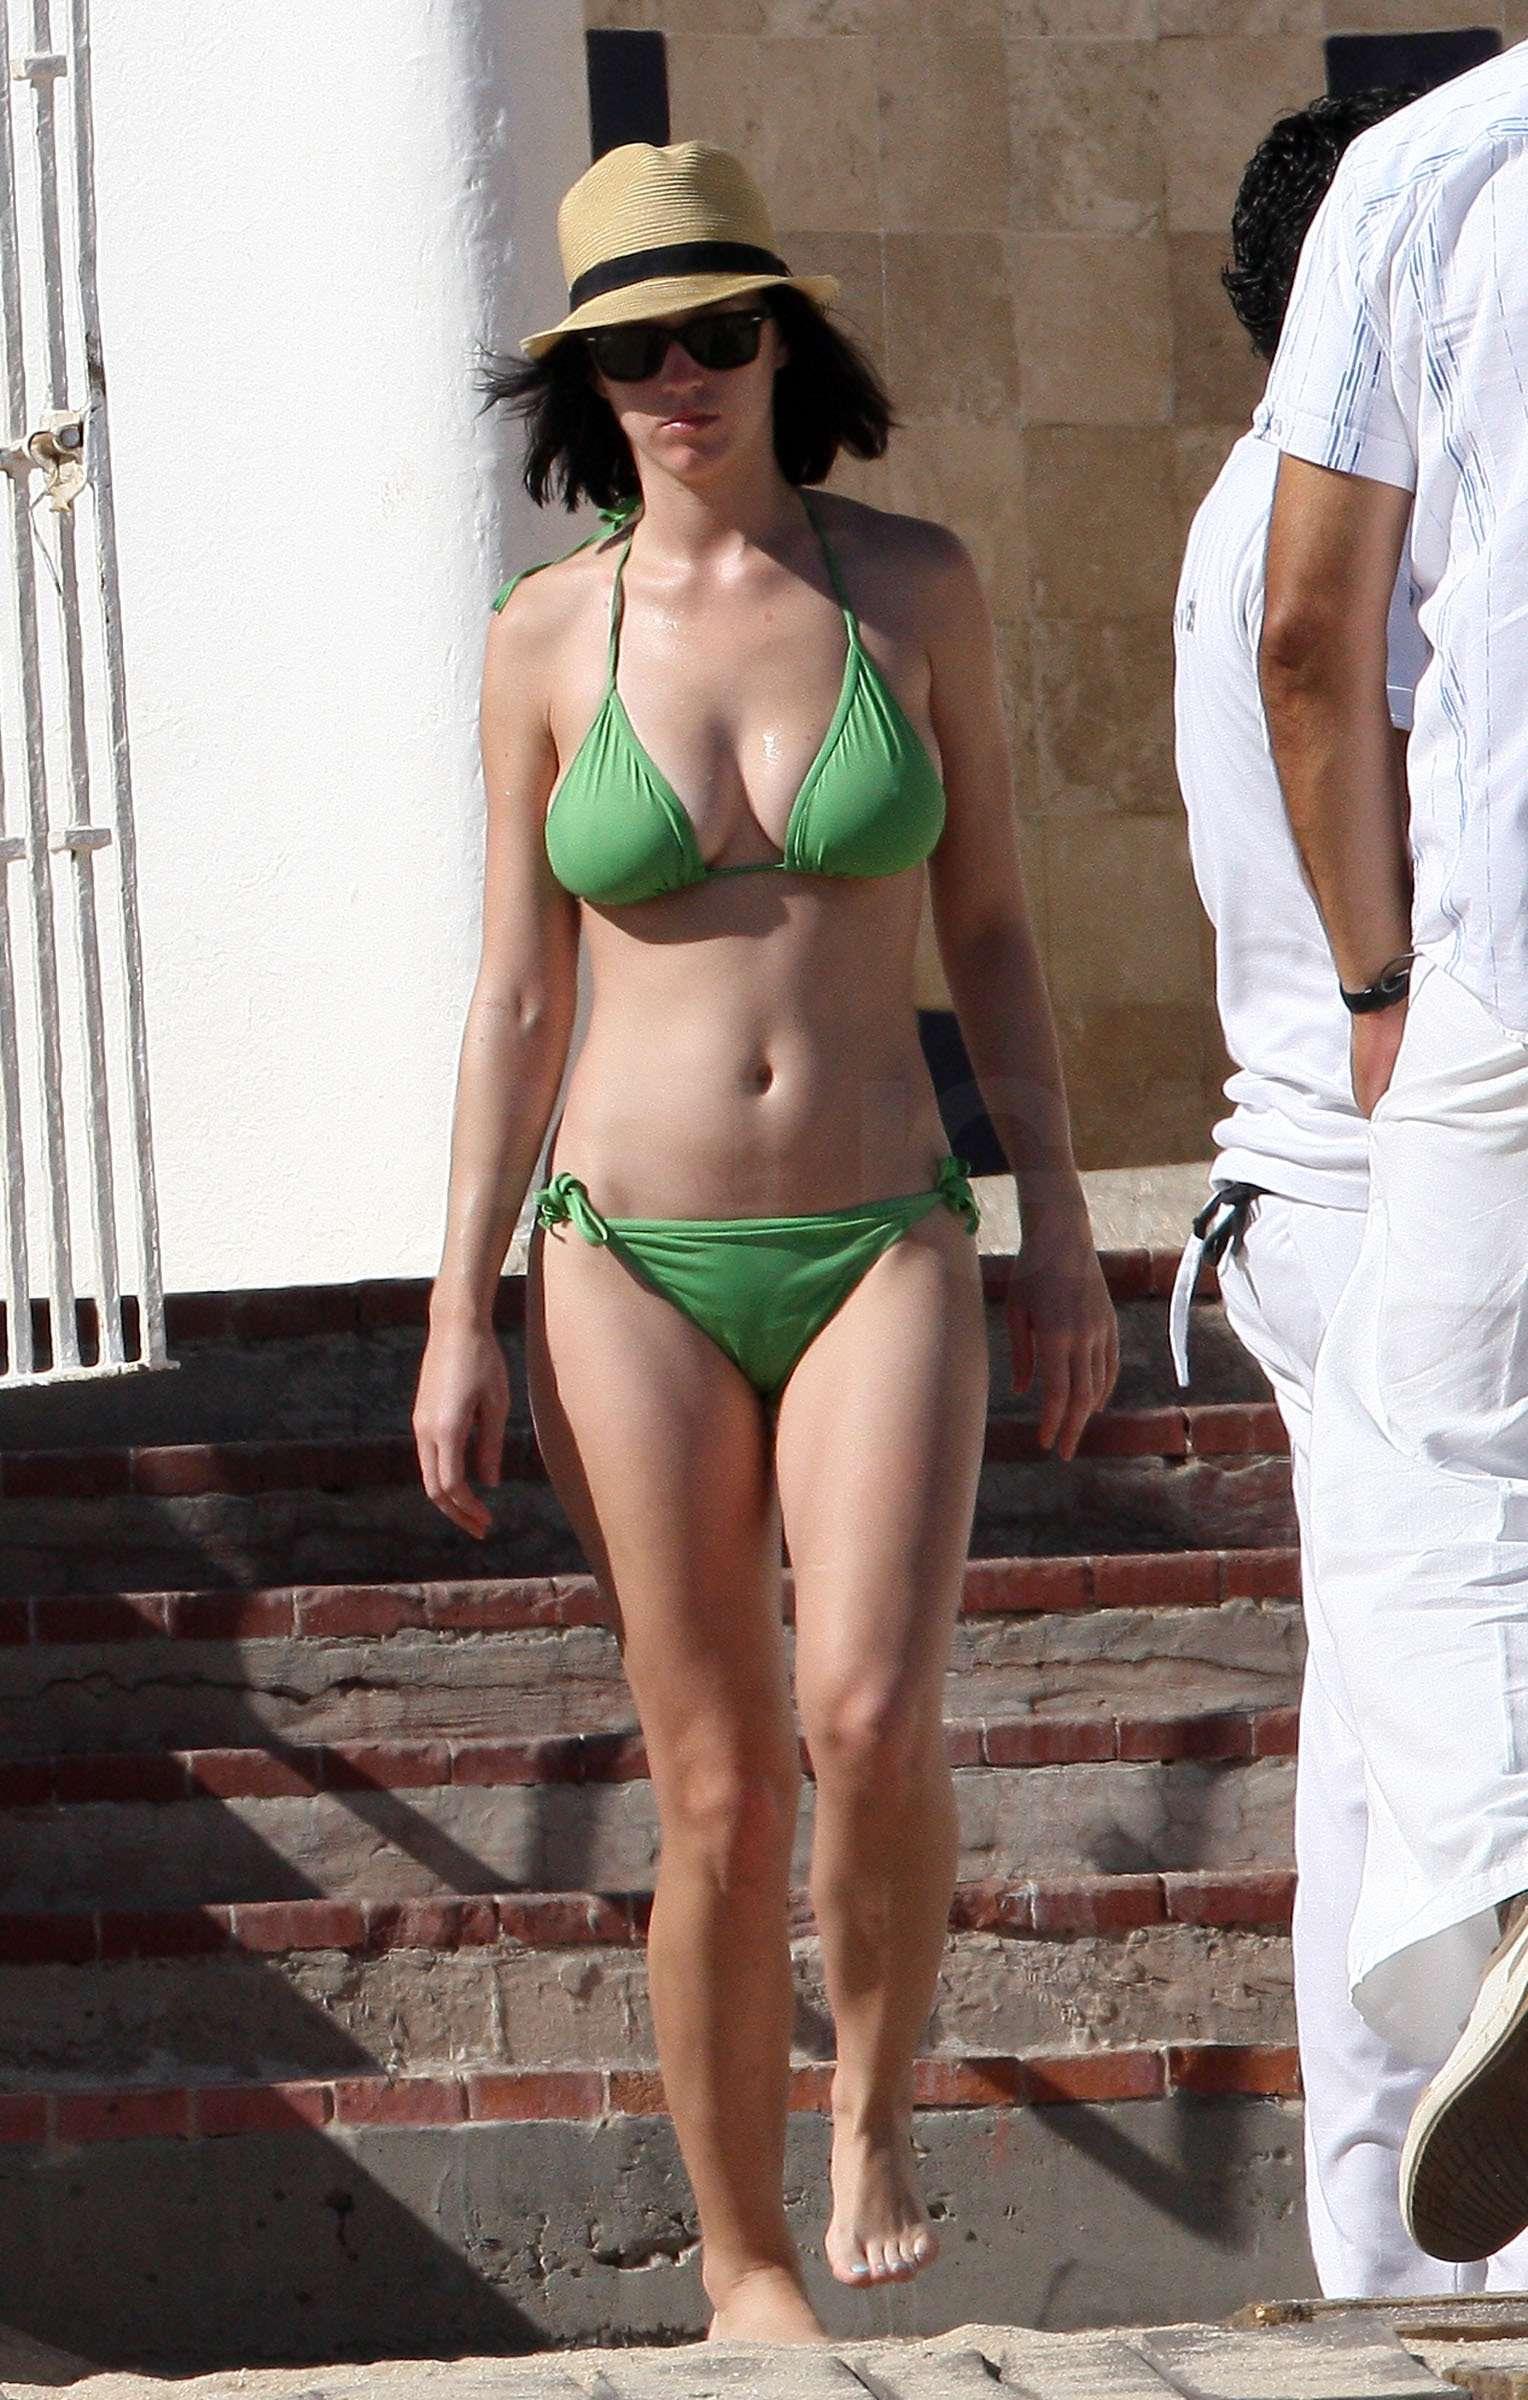 Katy Perry Bikini Photos in Mexico With Travis McCoy